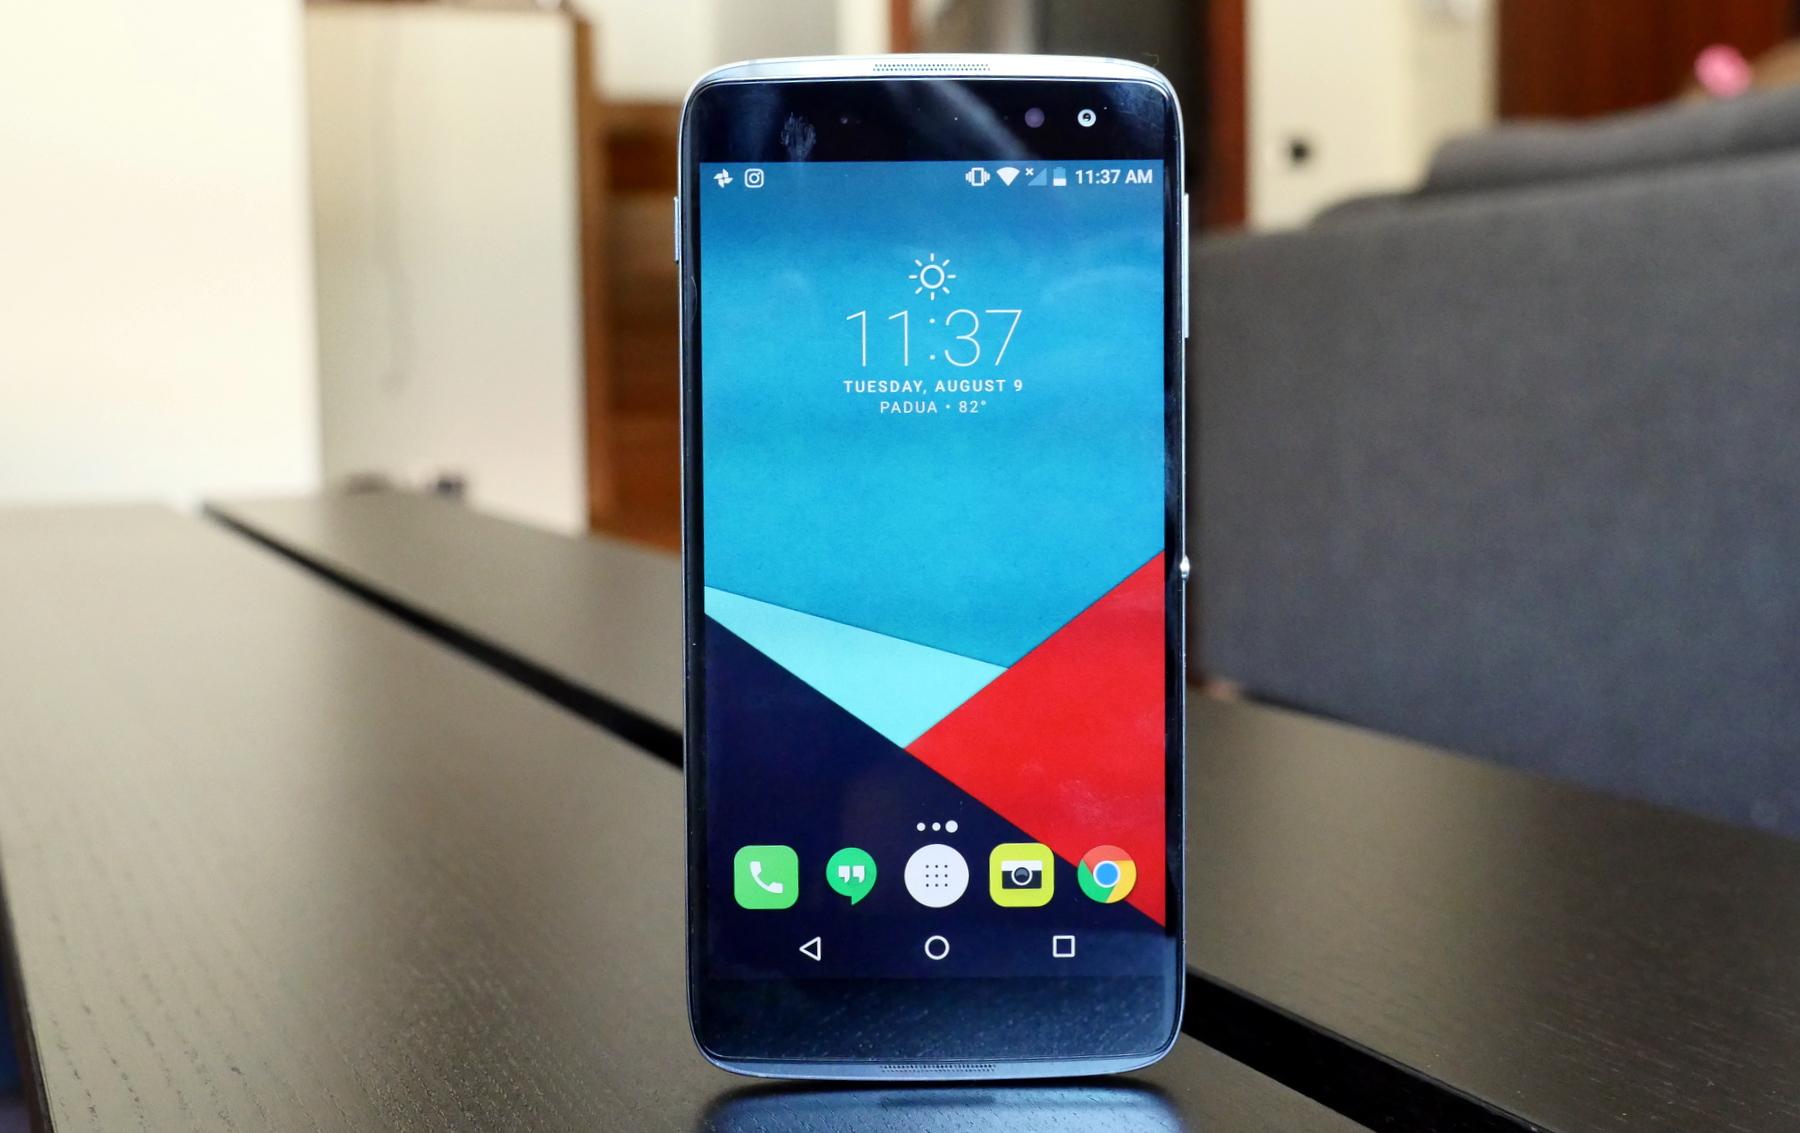 Android 7 alcatel idol 4